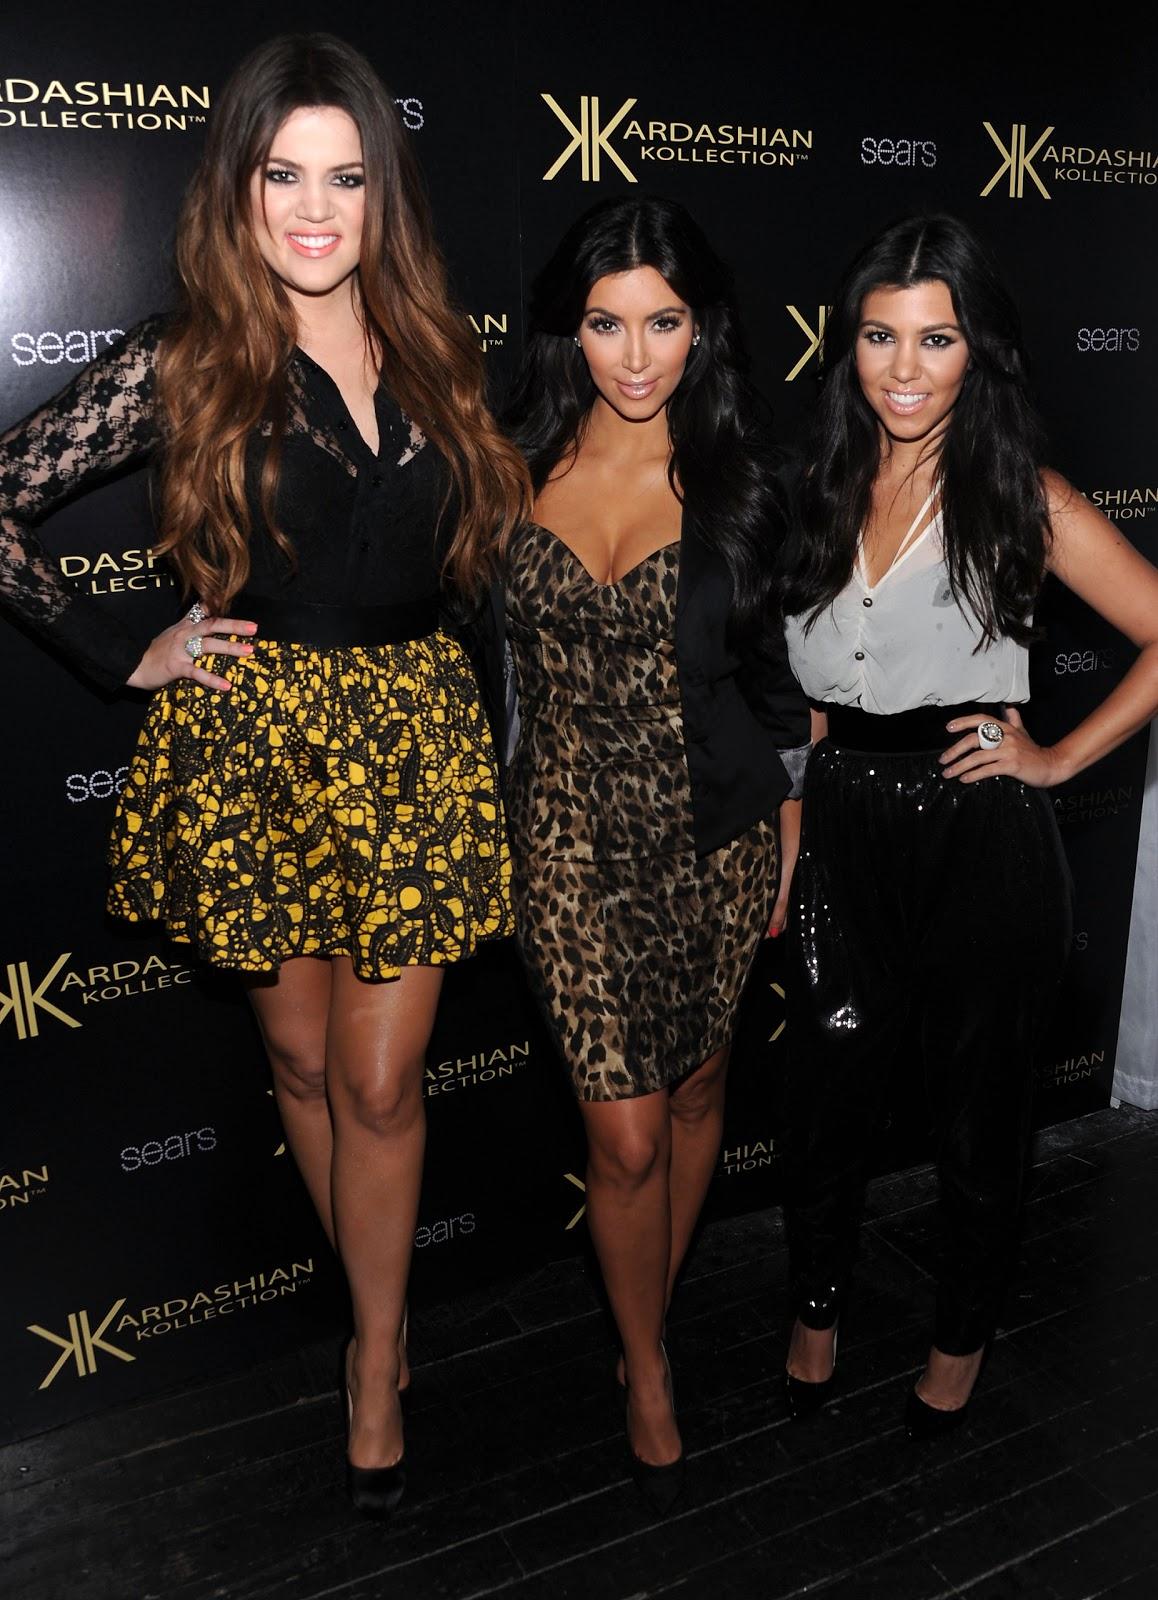 Looks - The eyewear kardashian line for sears video